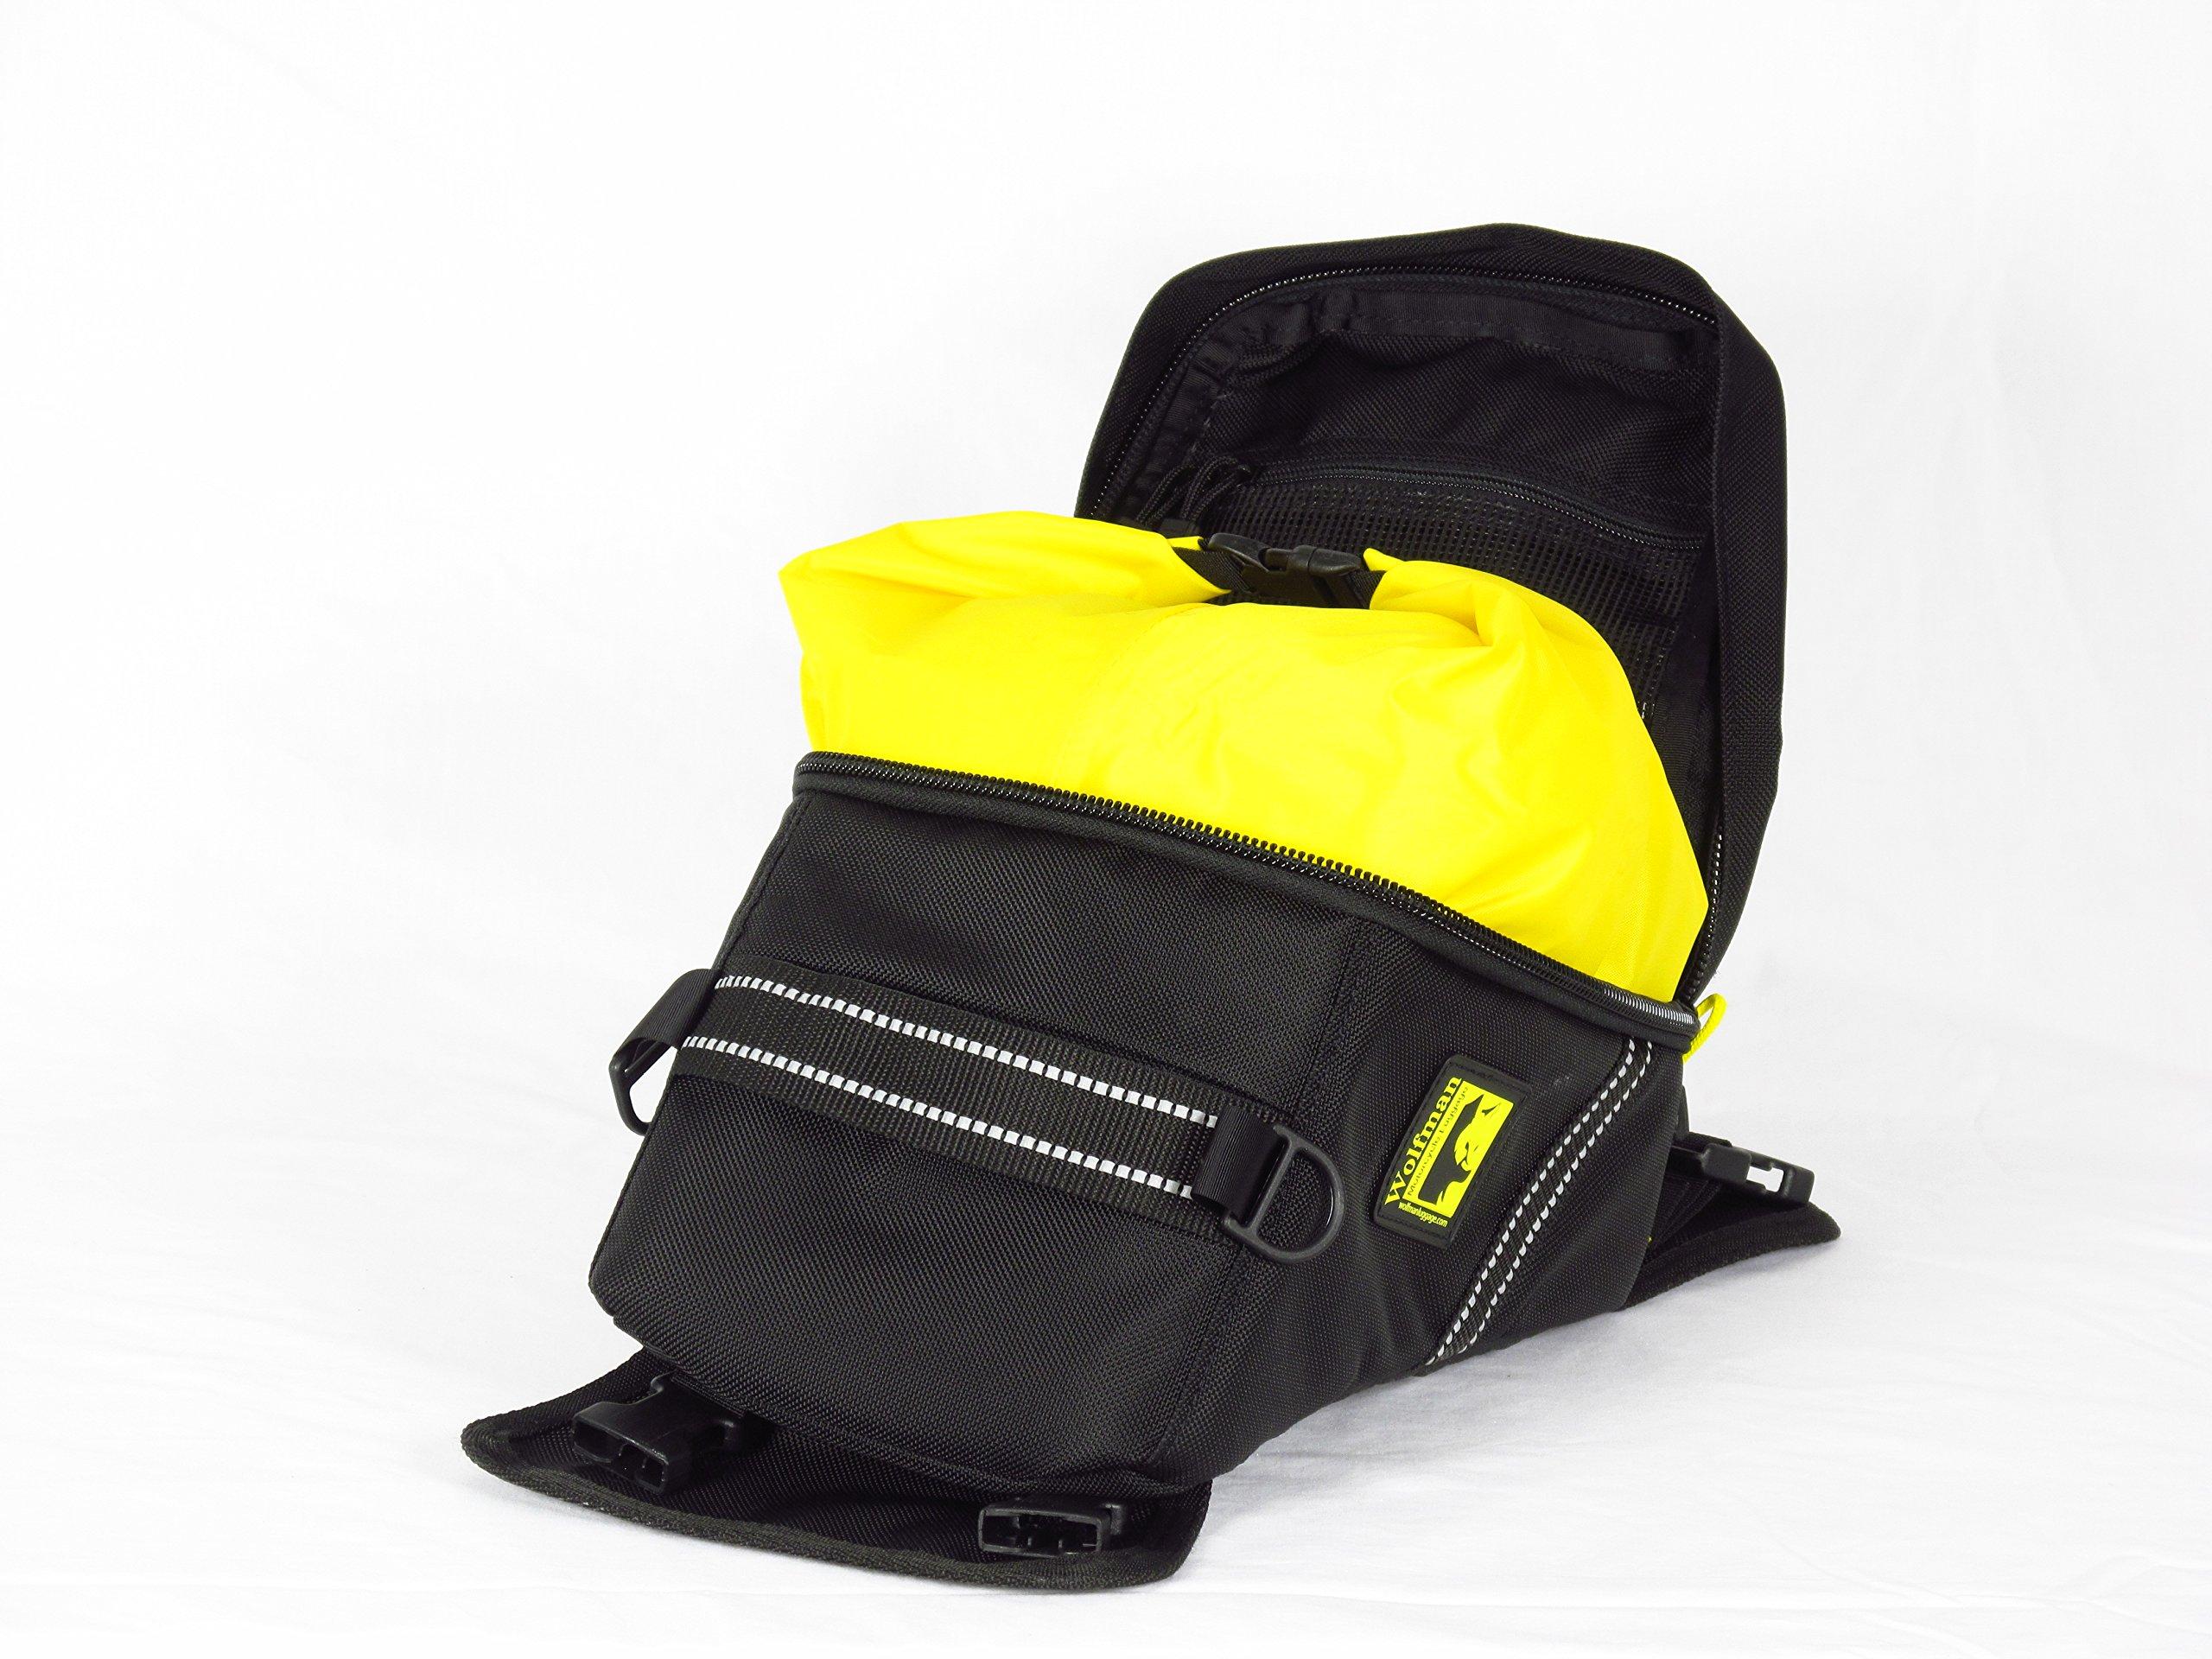 Wolfman Luggage L103 - Blackhawk Tank Bag Waterproof Liner